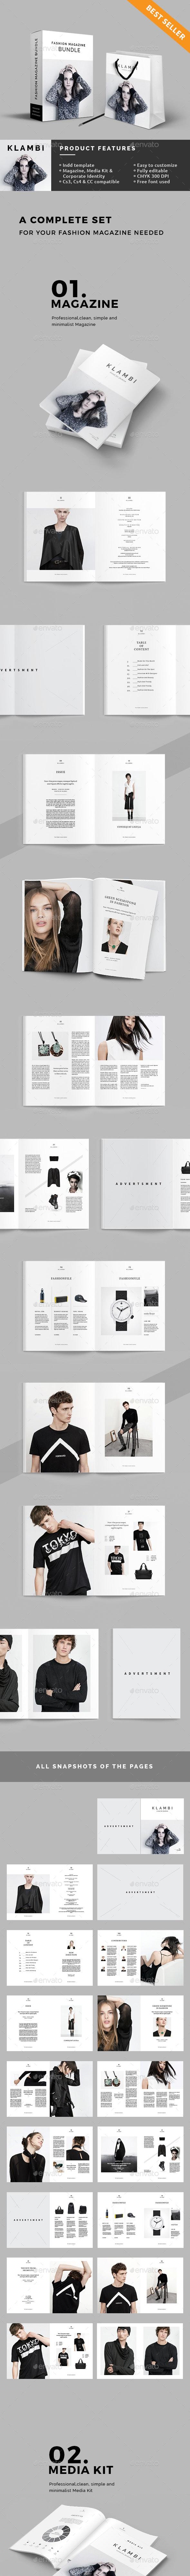 Bundle Fashion Magazine, Media Kit & Corporate Identity - Magazines Print Templates